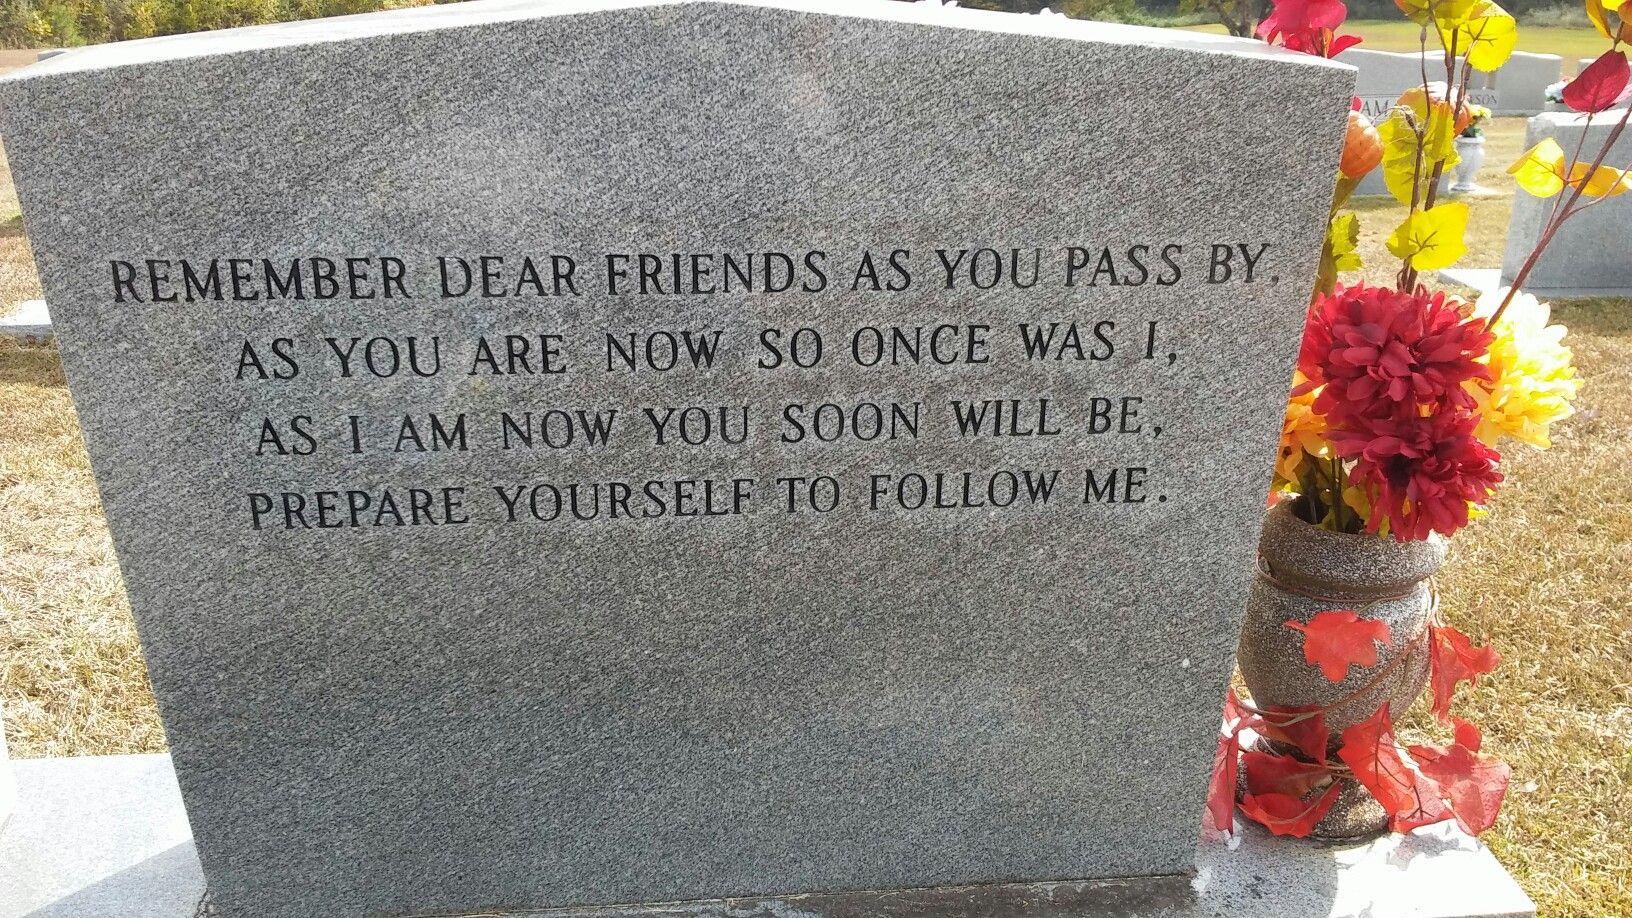 3dbb1a1593c832862c21d7fb607405fc - Gardens Of Memory Cemetery Mcminnville Tn